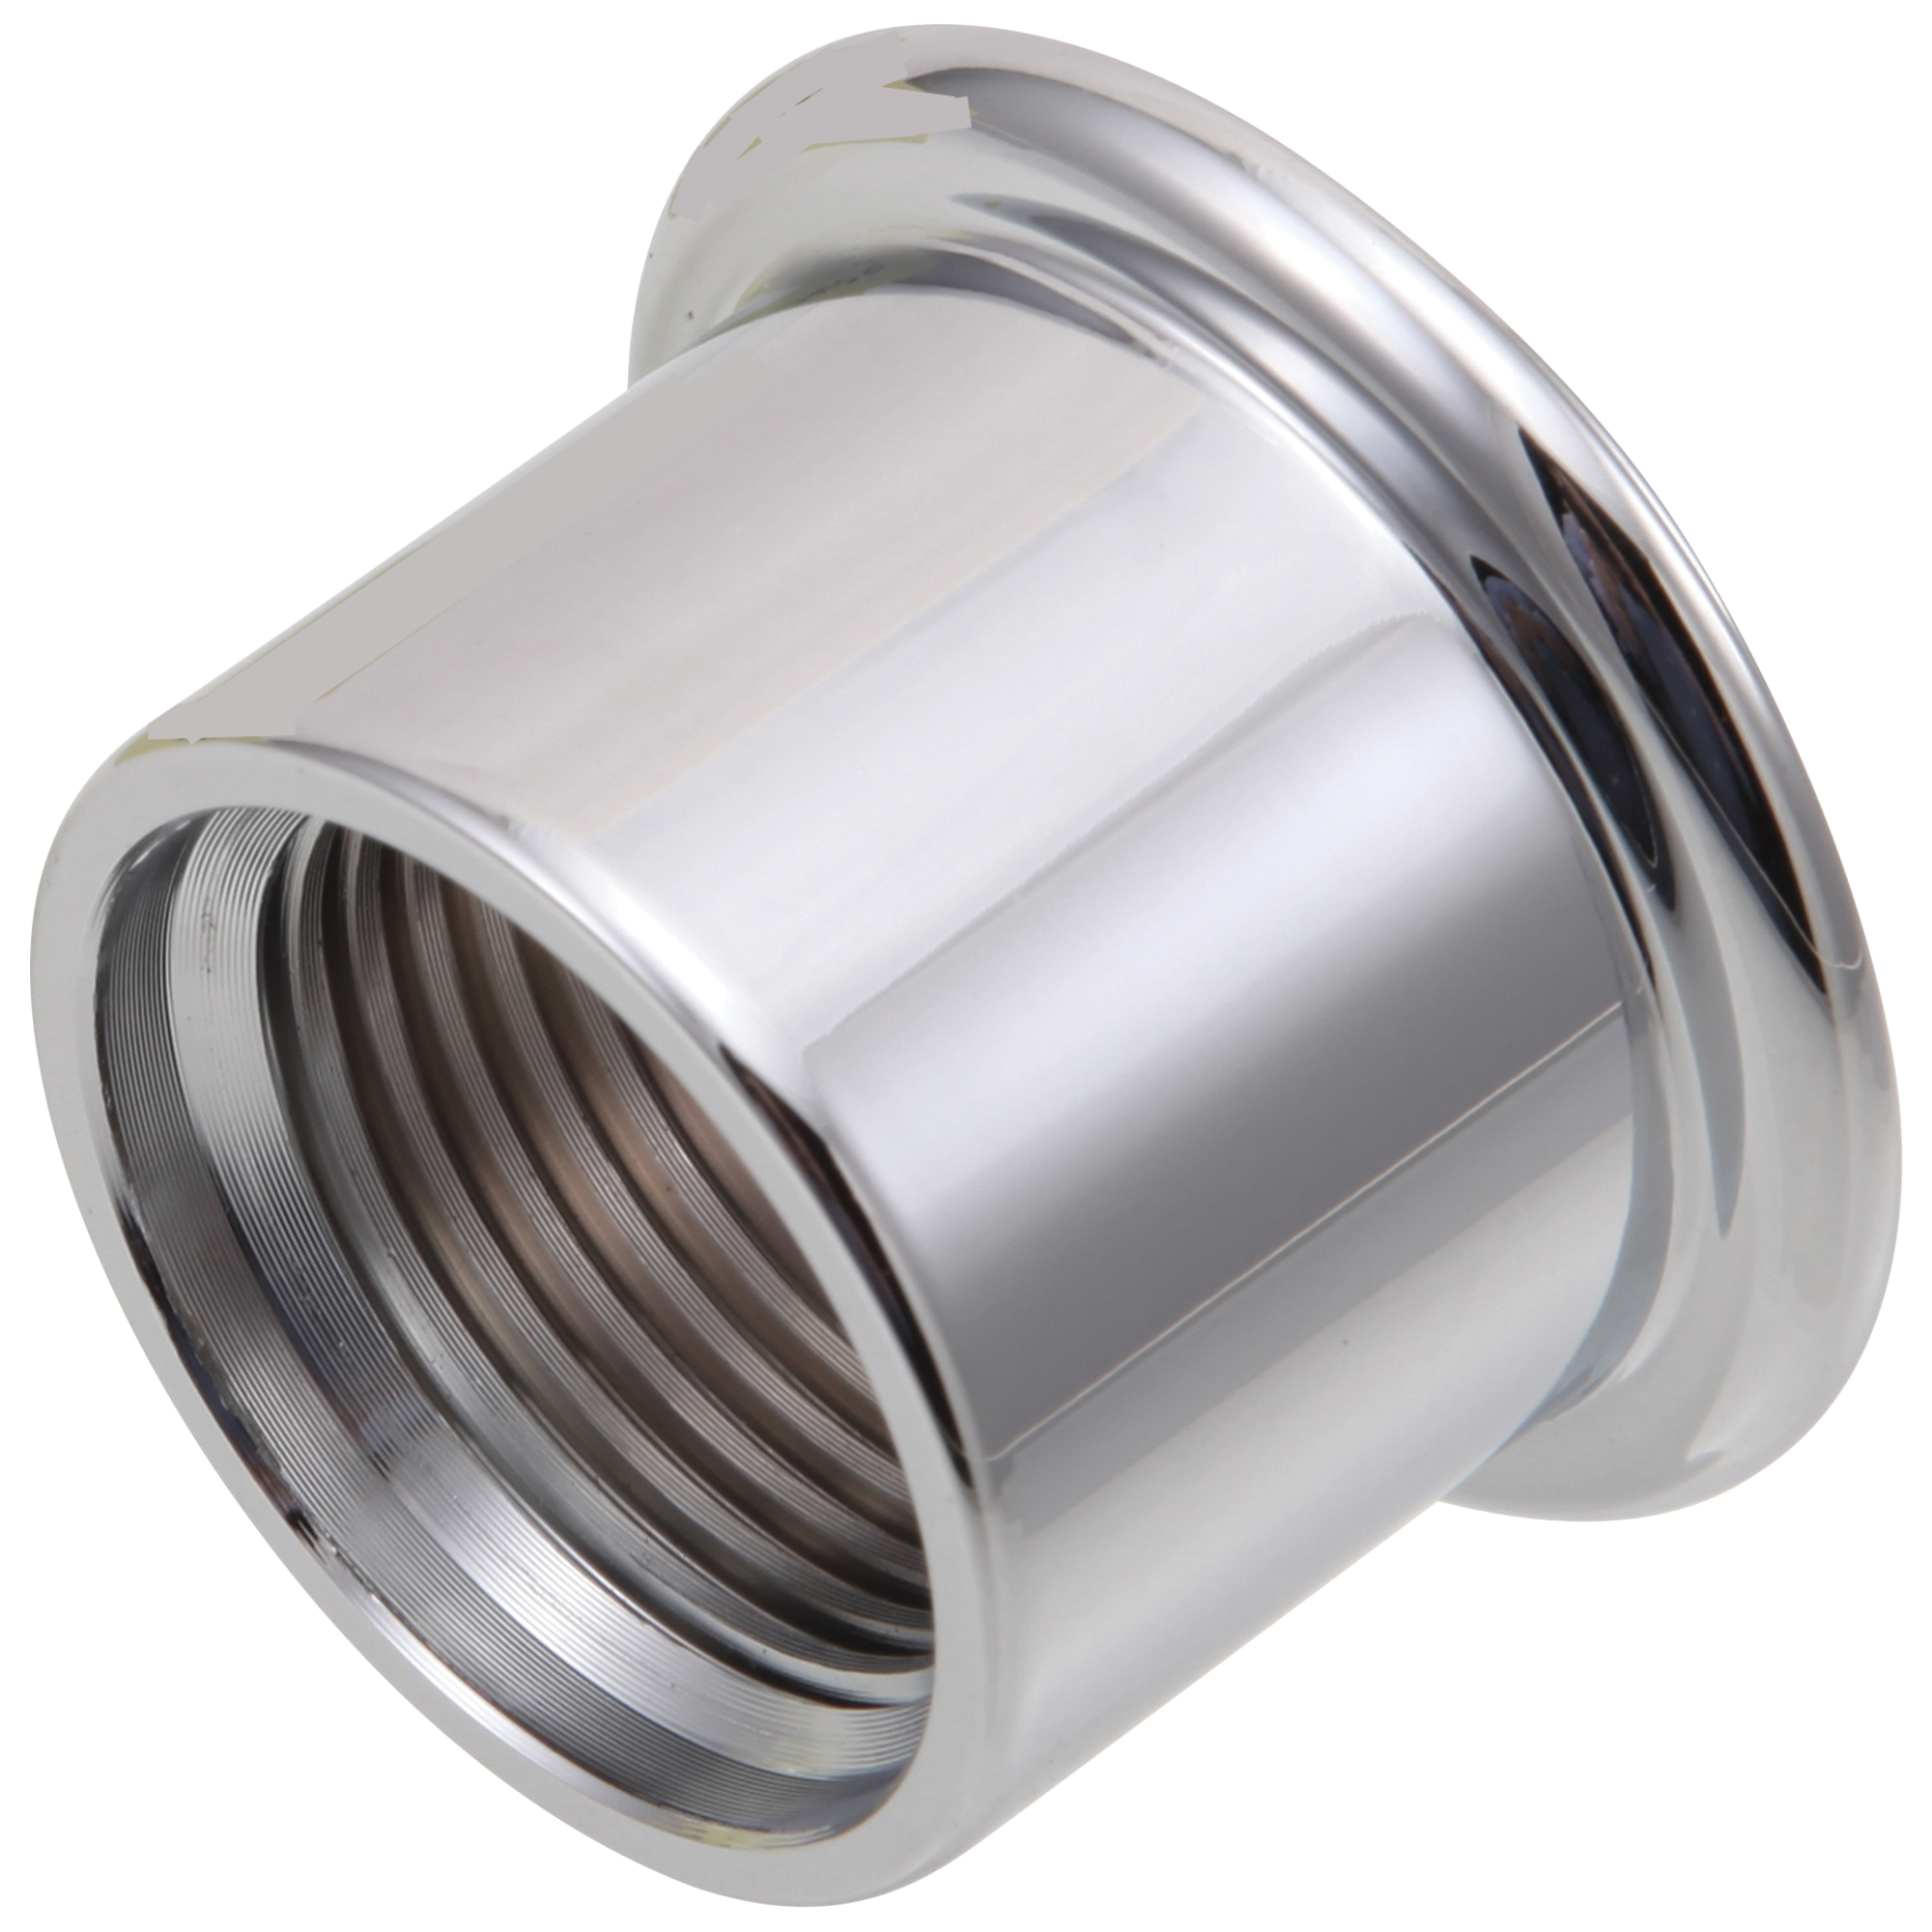 Brizo® RP51917BL Jason Wu Diverter Trim Sleeve, Matte Black, Import